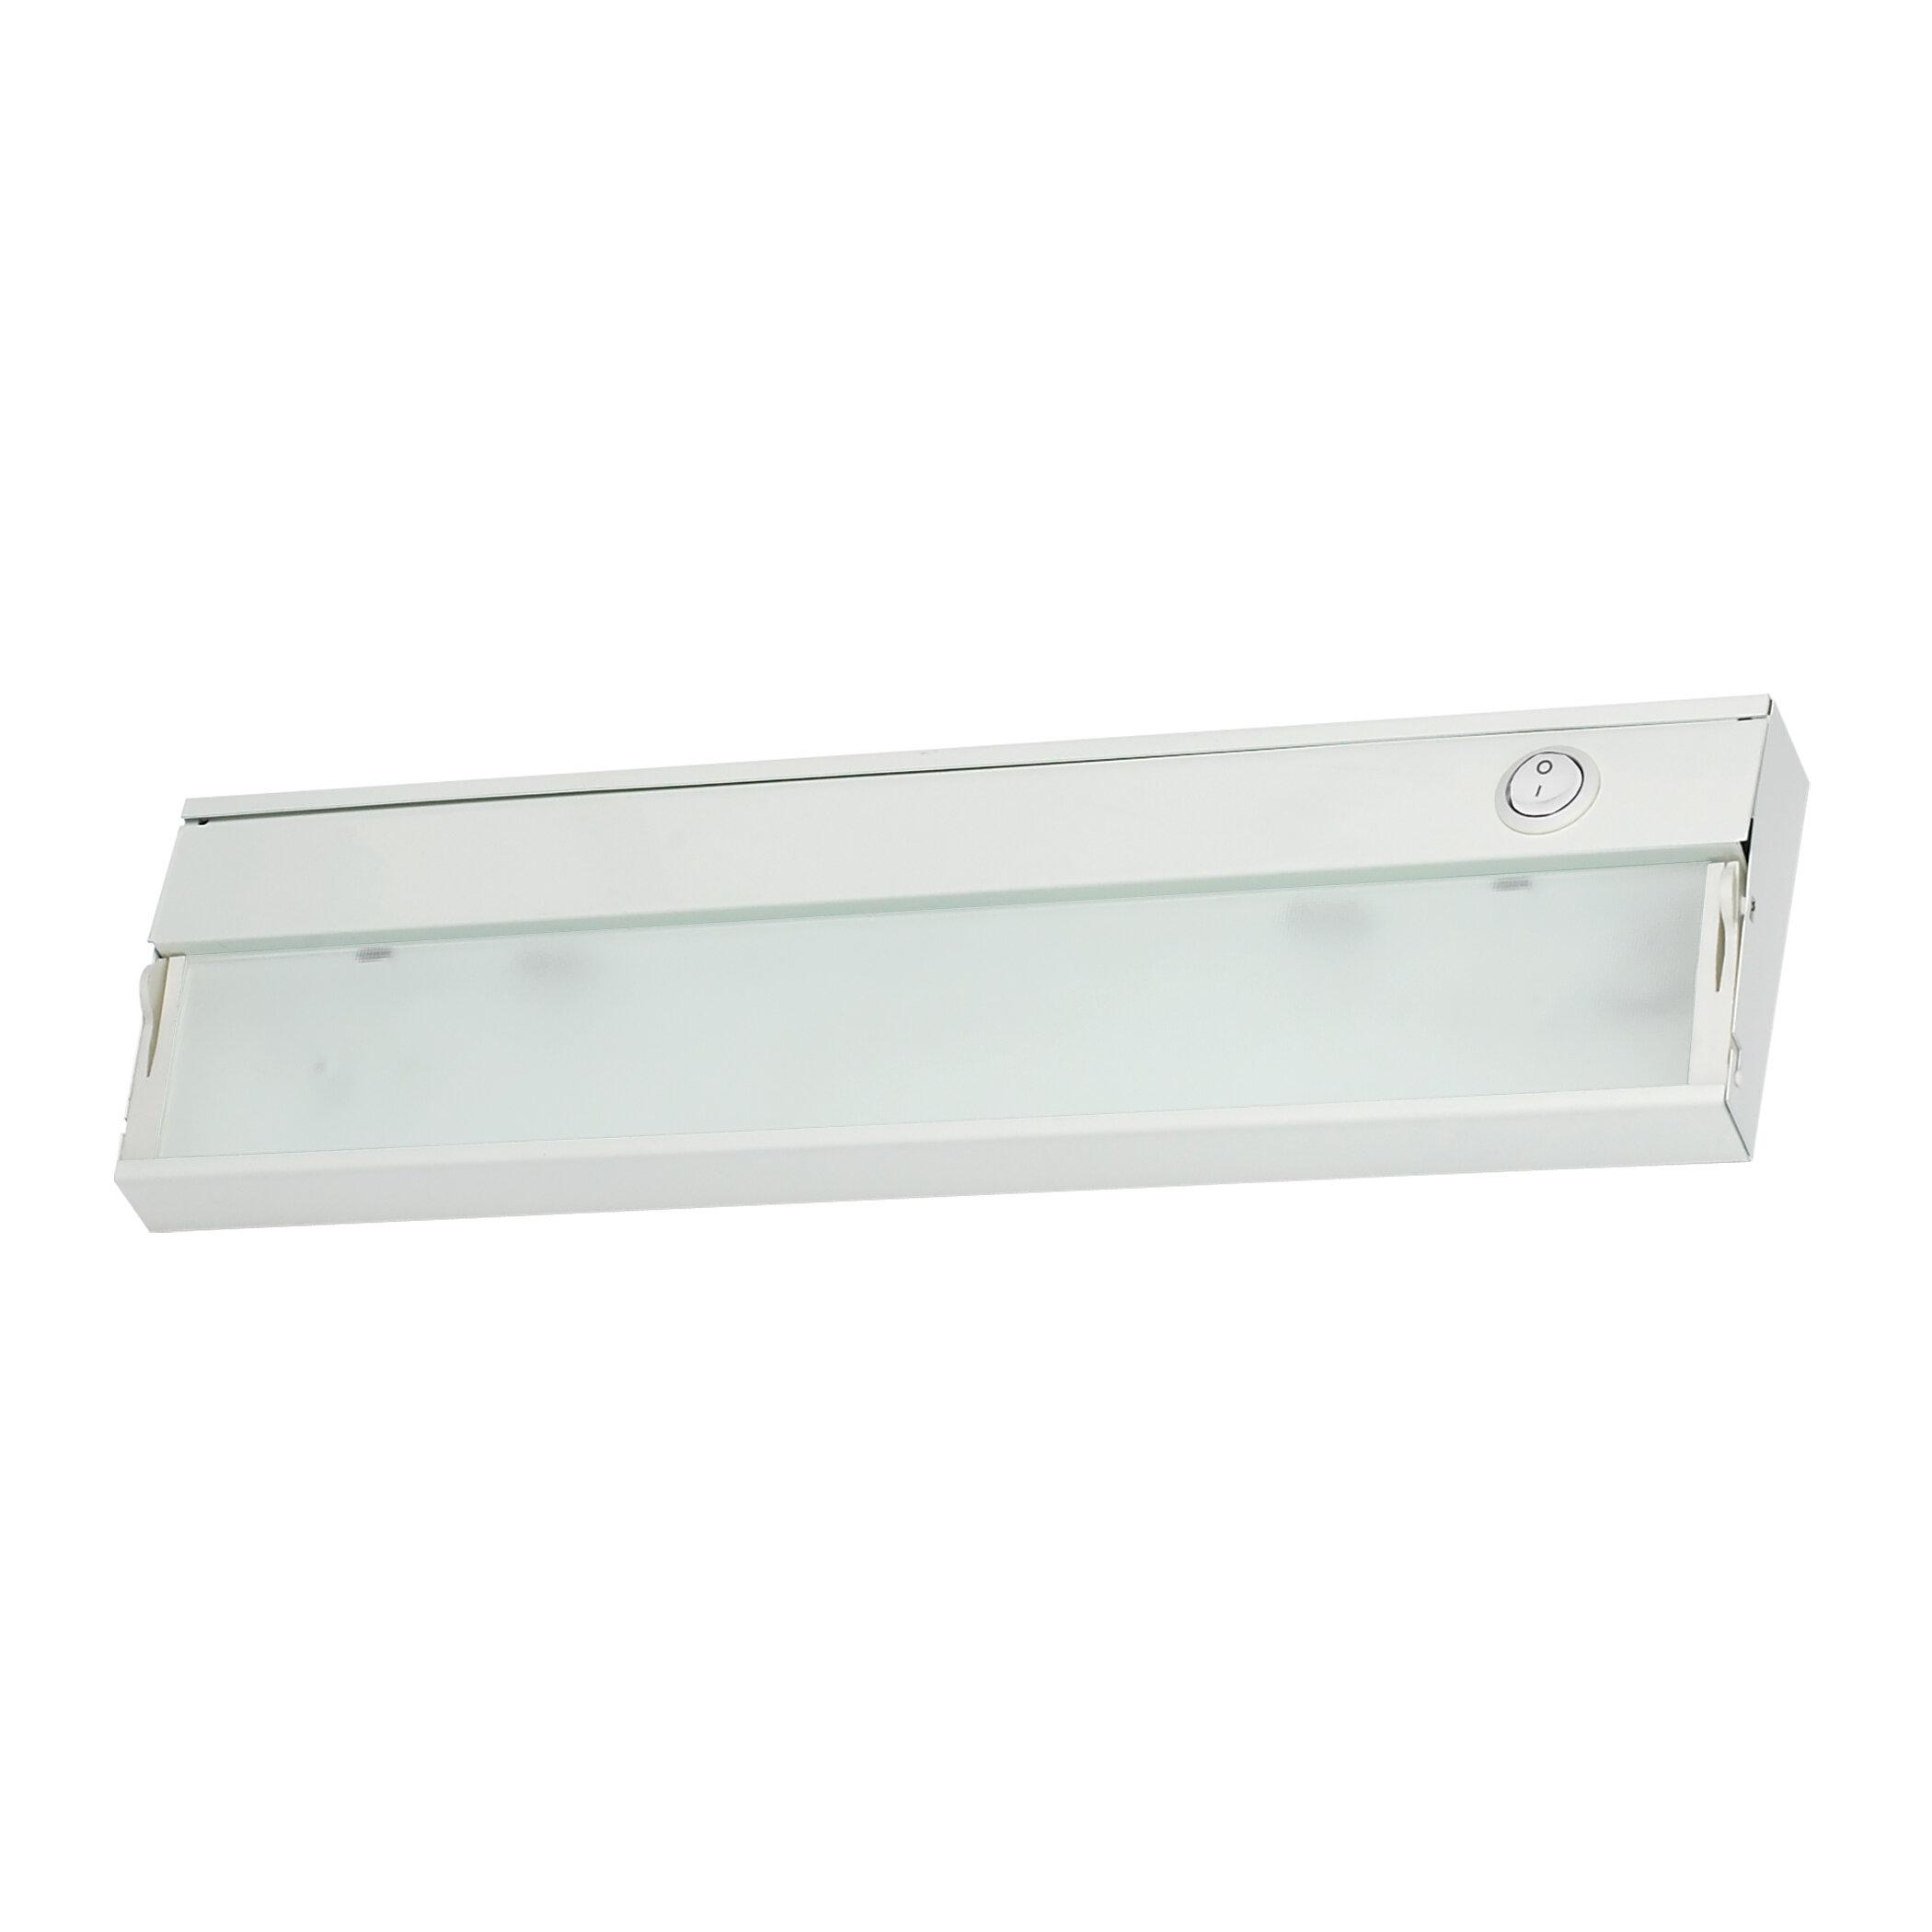 Alico 9 Xenon Under Cabinet Bar Light Wayfair